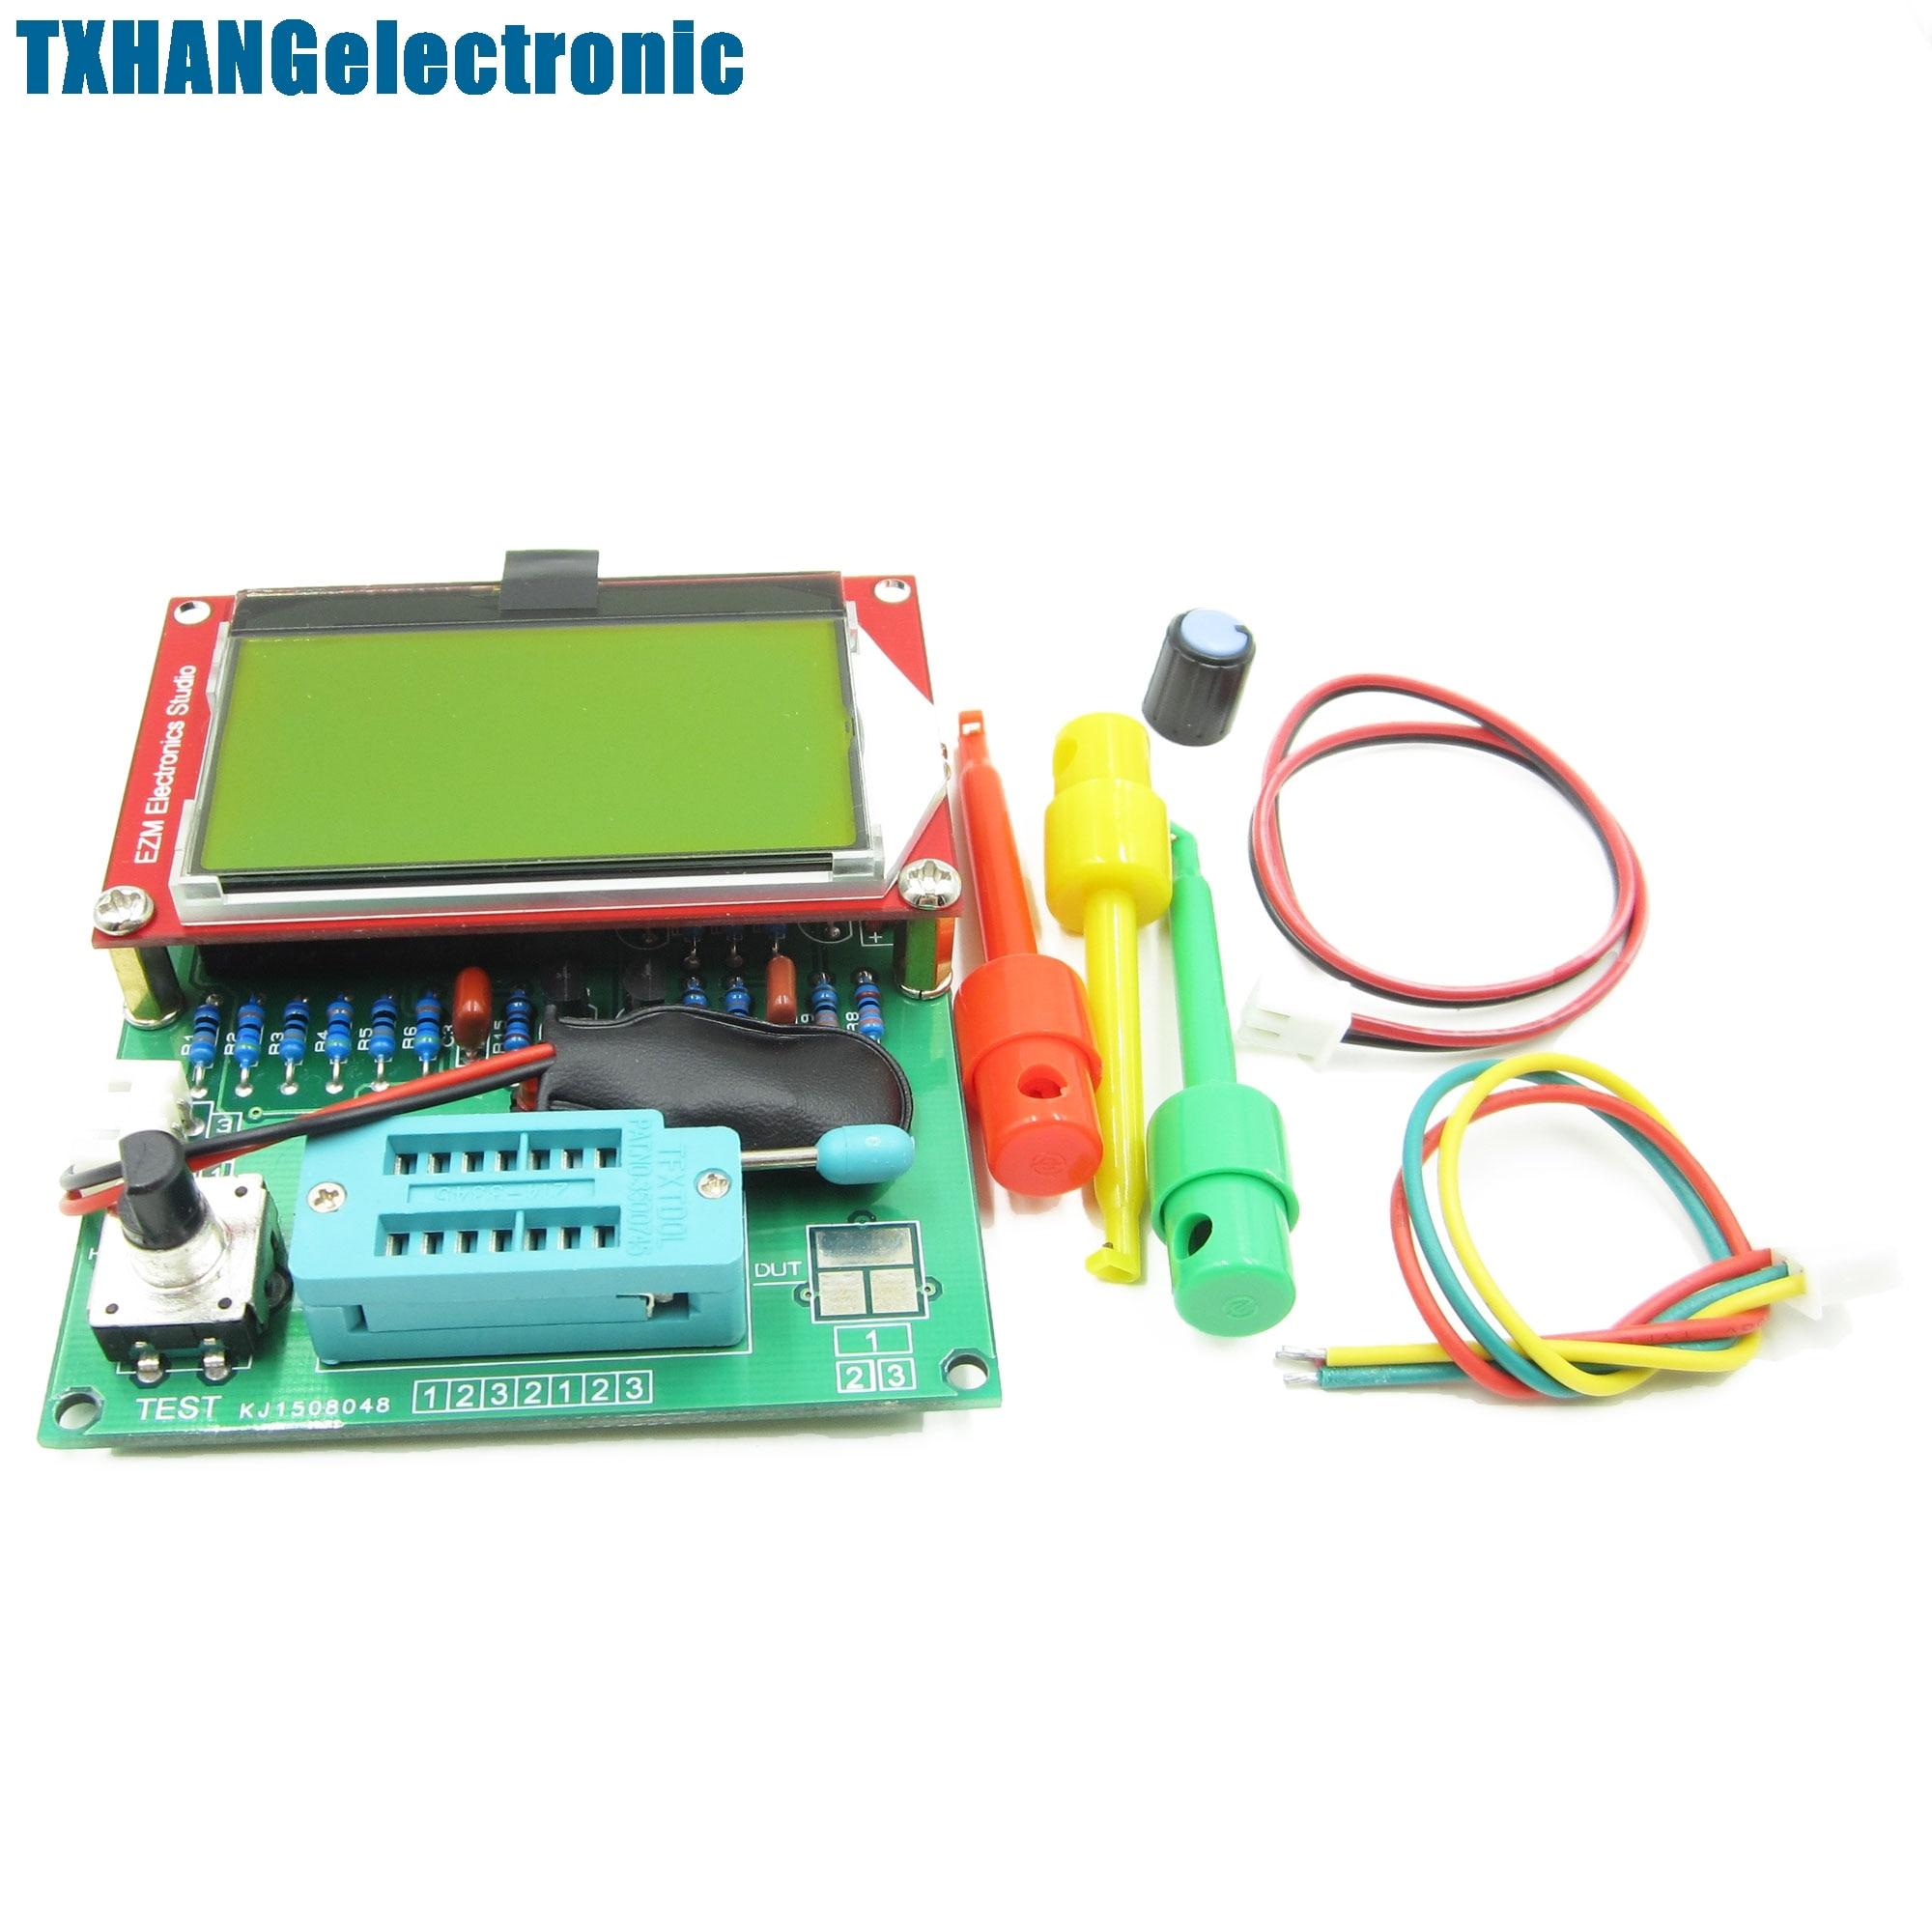 Best Seller 2016 Ezm328gm328rtransistor Tester Esr Frequency Transistor For Repair Meter Square Wave Genera